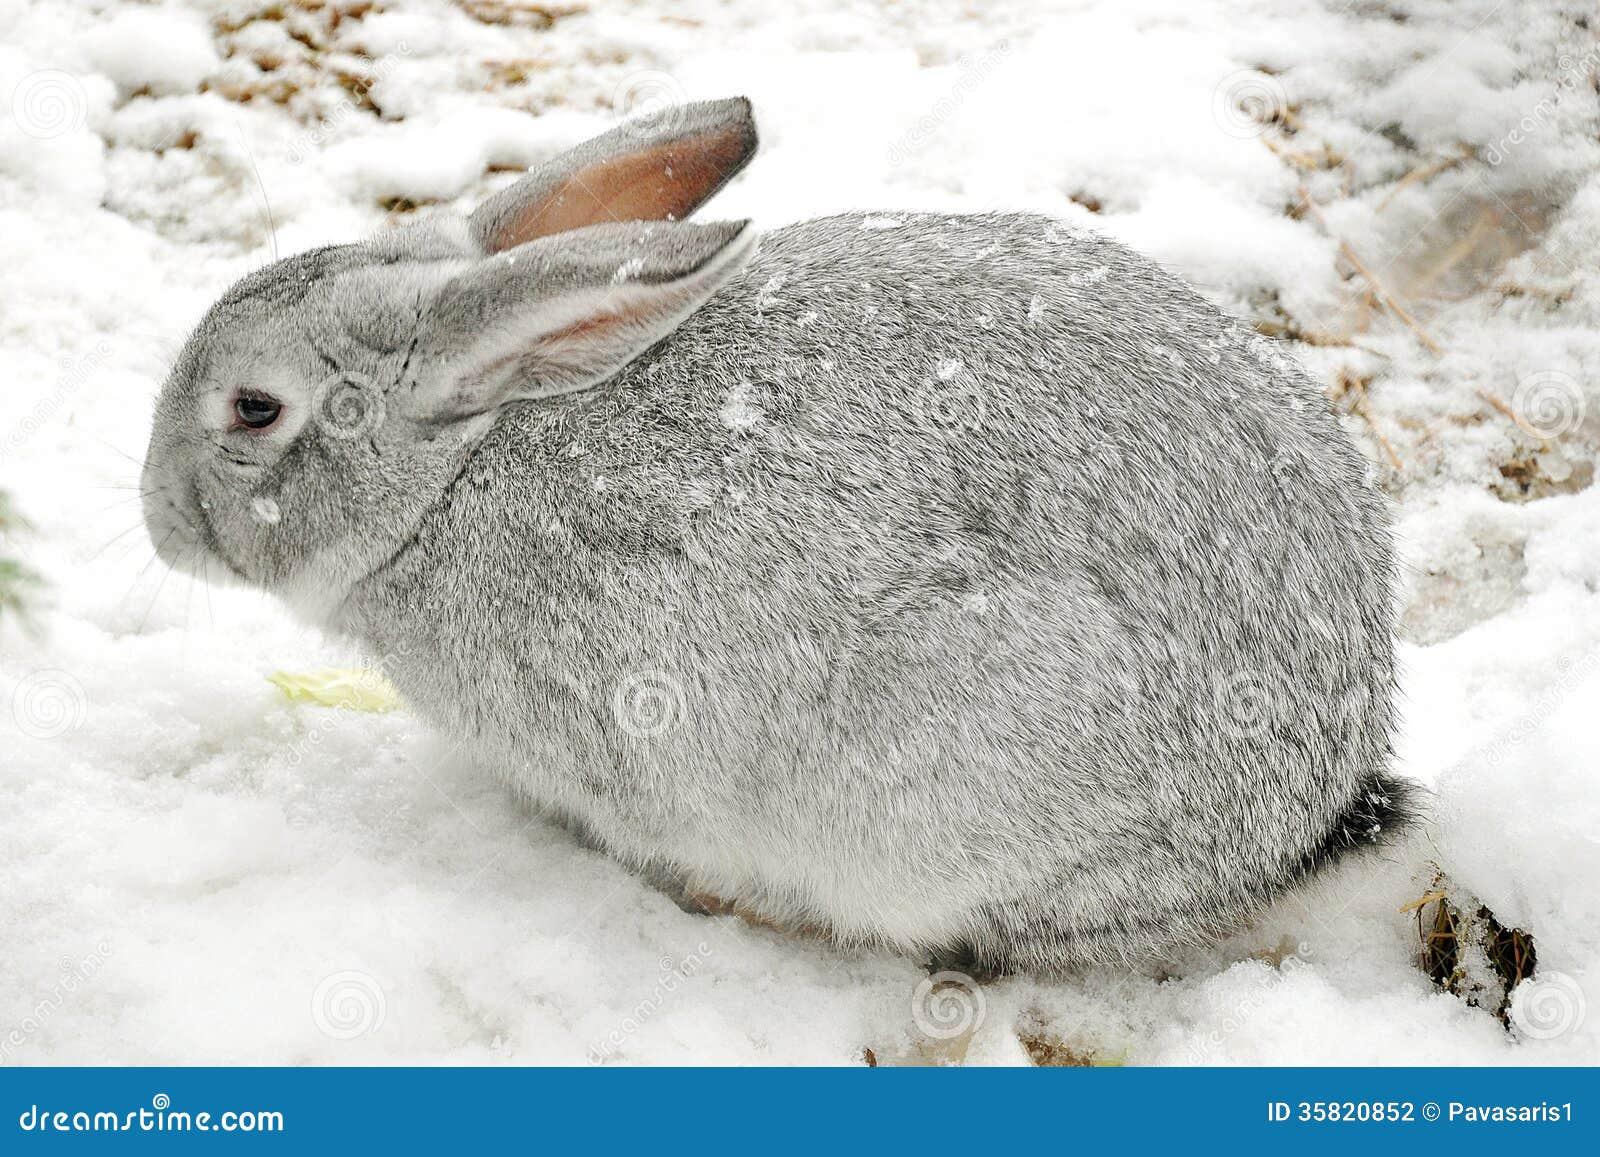 winter rabbit stock photography image 35820852. Black Bedroom Furniture Sets. Home Design Ideas